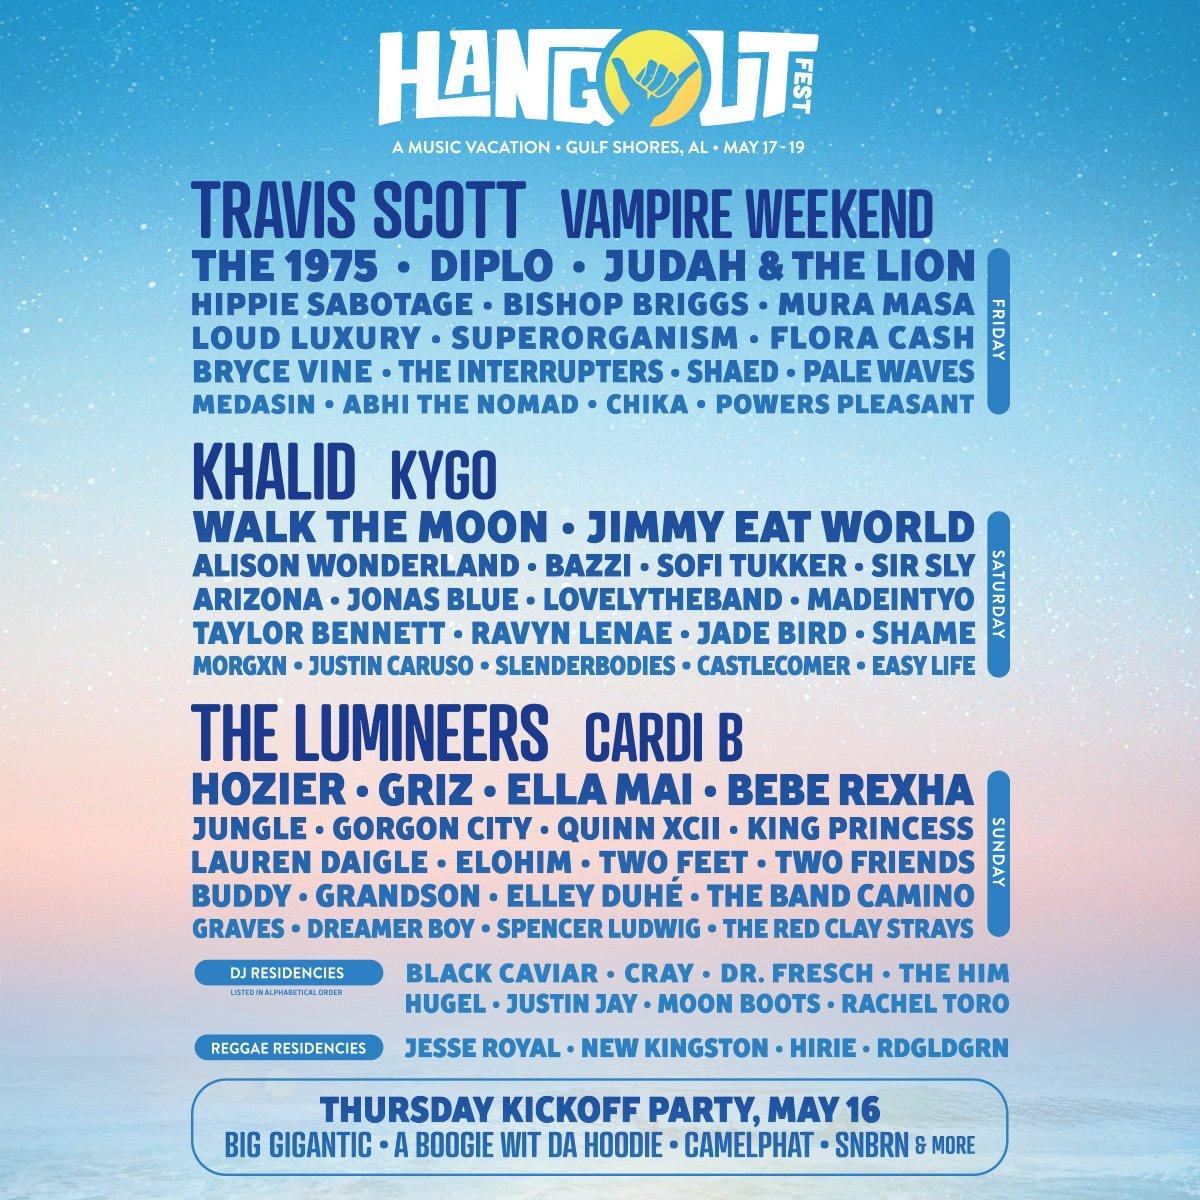 Hangout Music Festival 2020.Hangout Music Festival 2020 Festival 2020